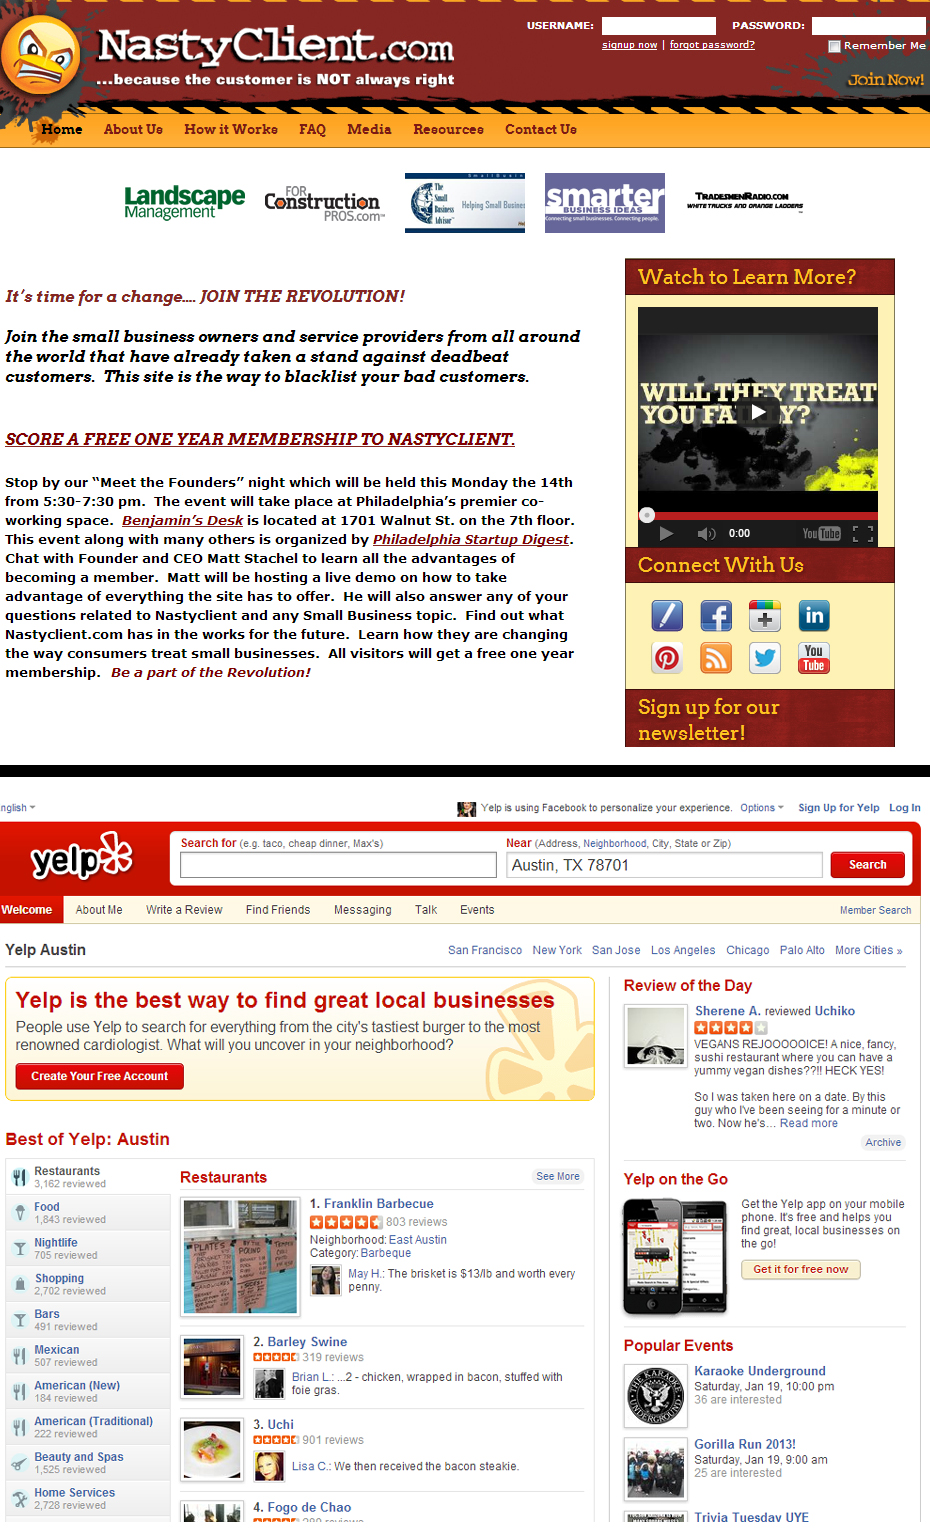 nastyclient.com vs. yelp